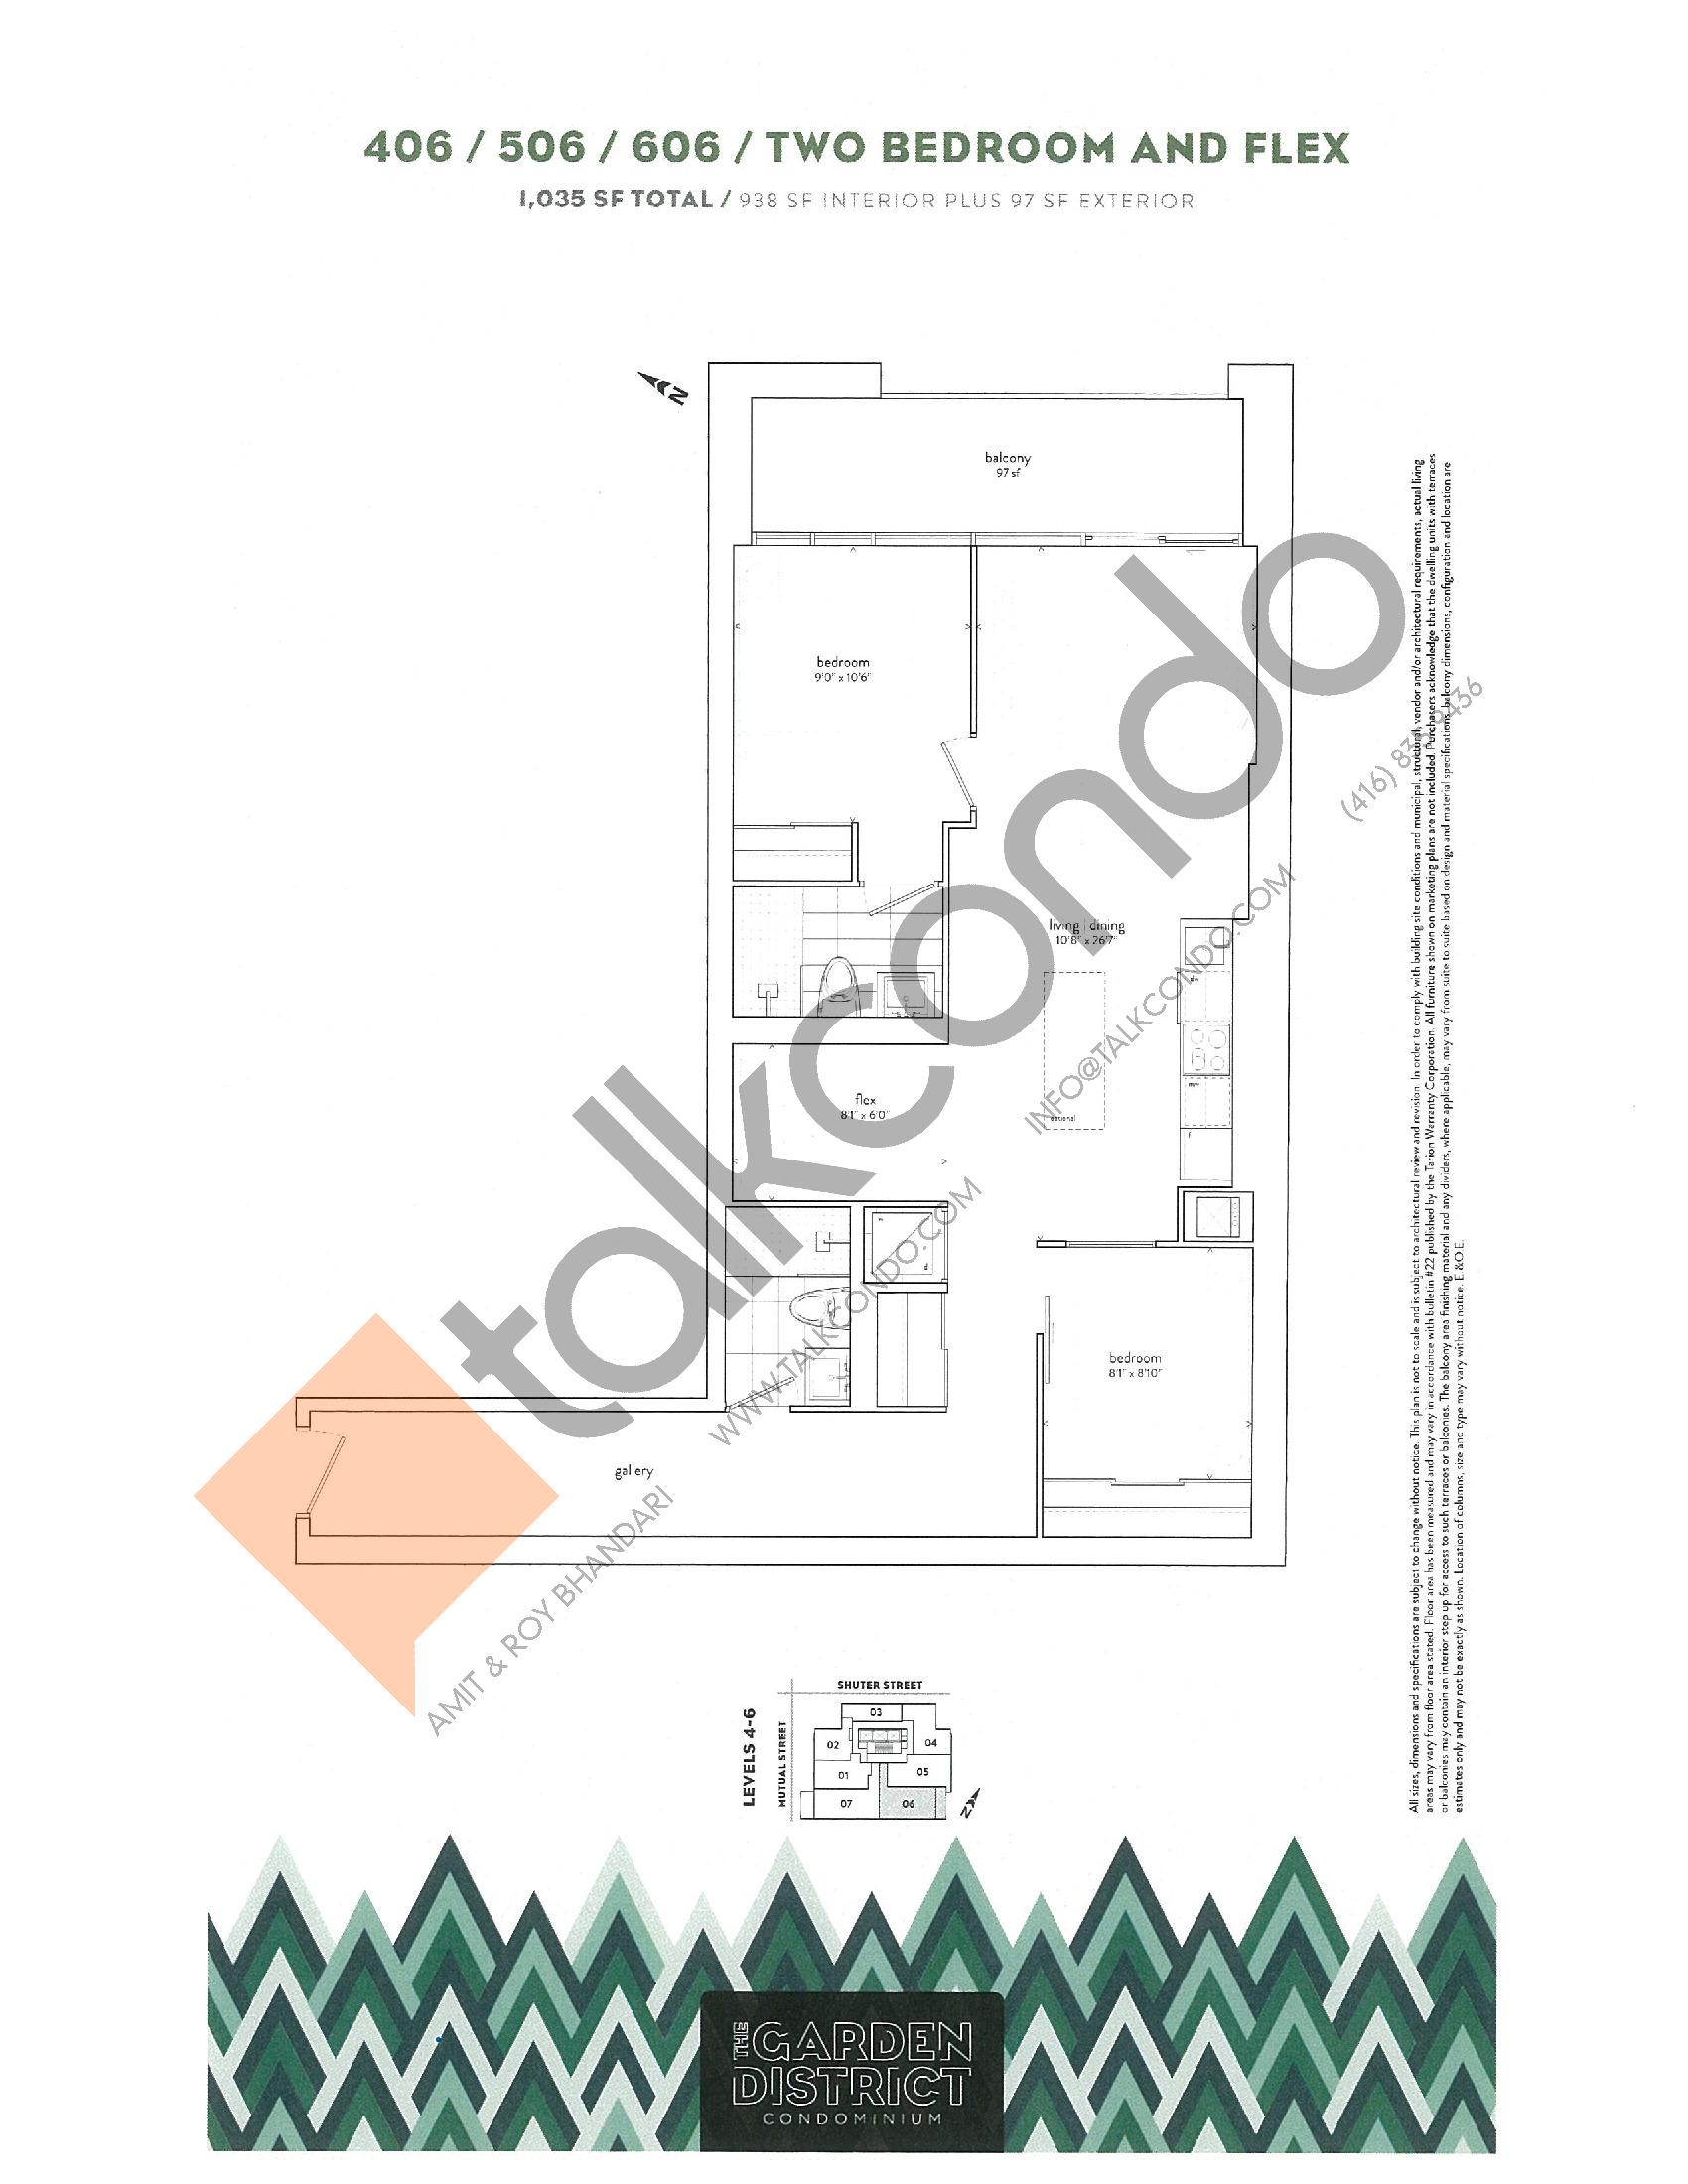 406 / 506 / 606 Floor Plan at Garden District Condos - 938 sq.ft